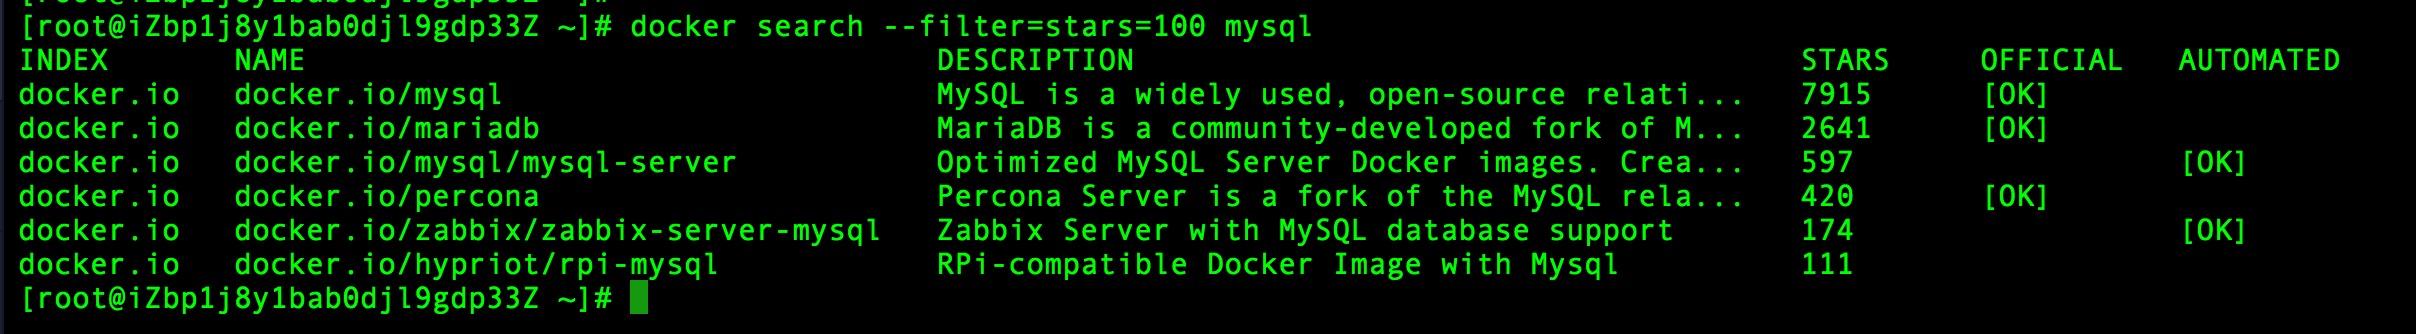 Docker 搜索镜像